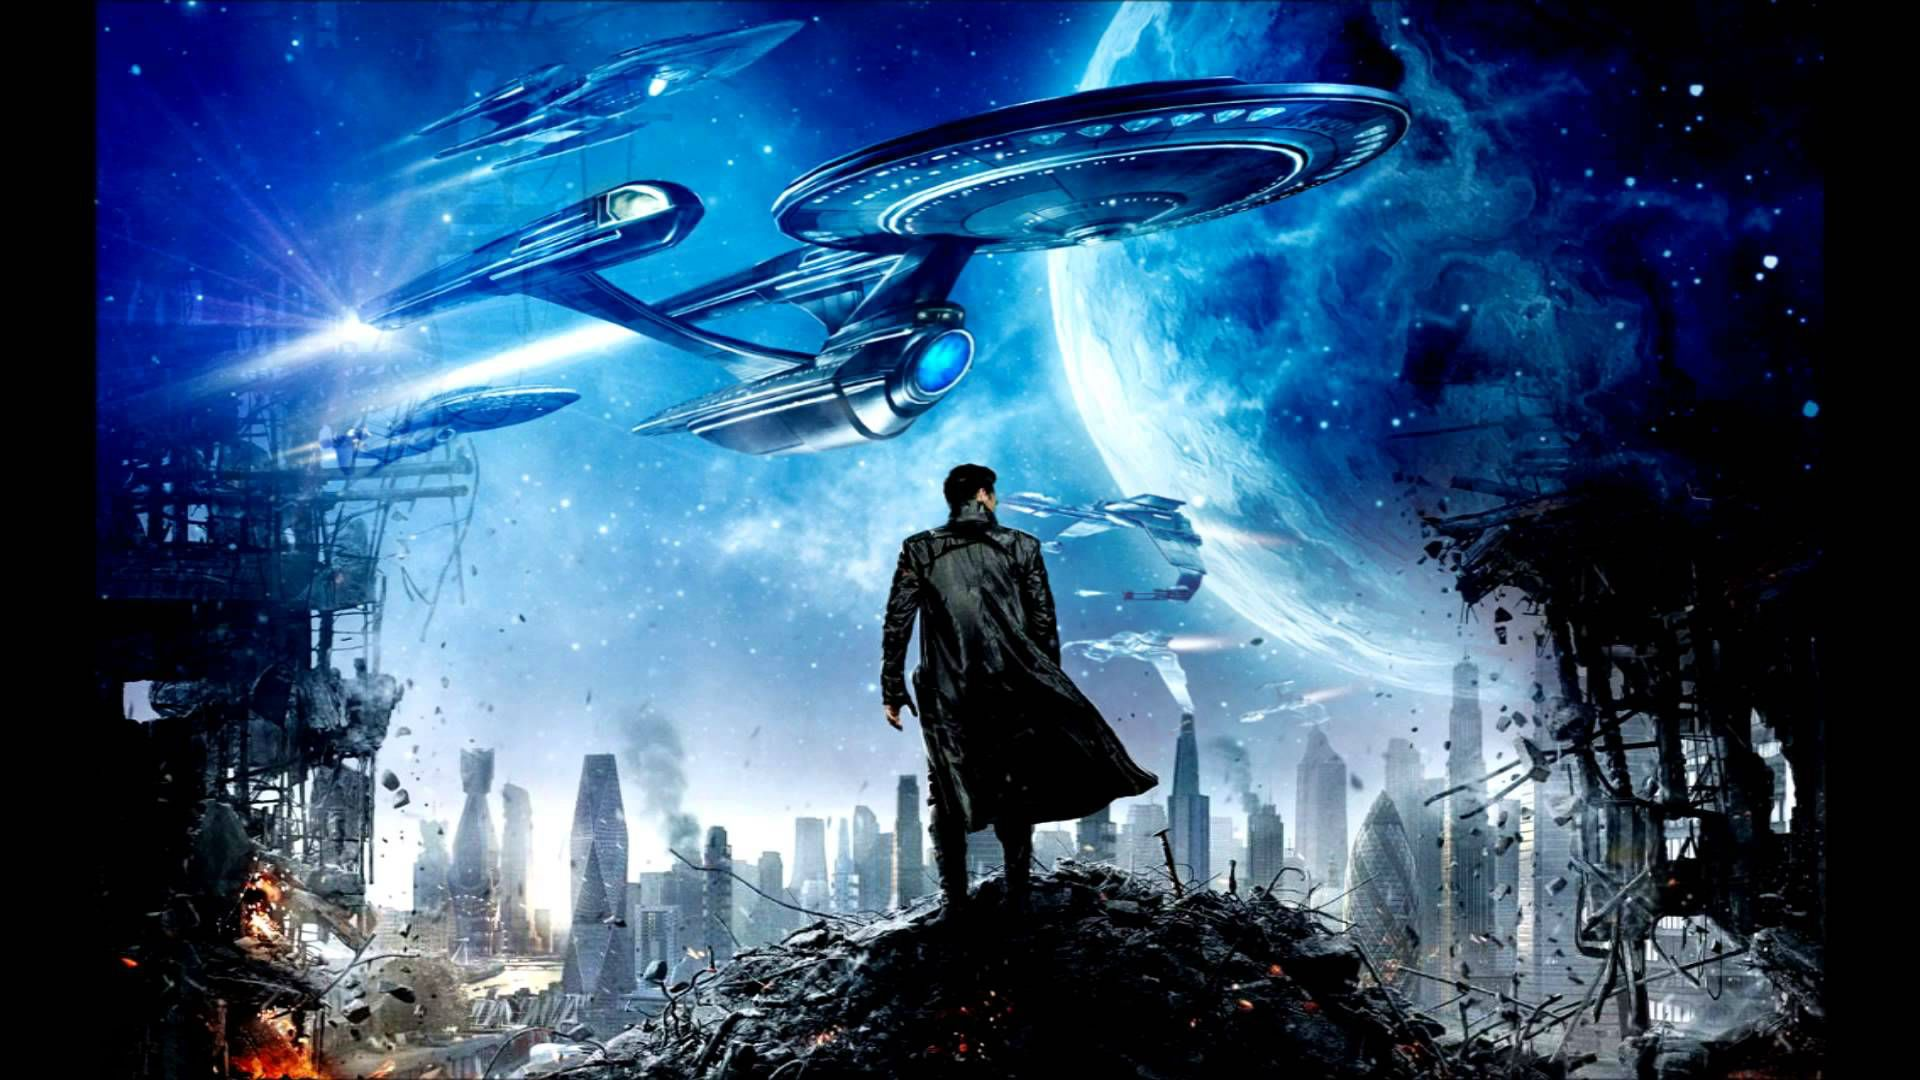 Star Trek Into Darkness Wallpapers Top Free Star Trek Into